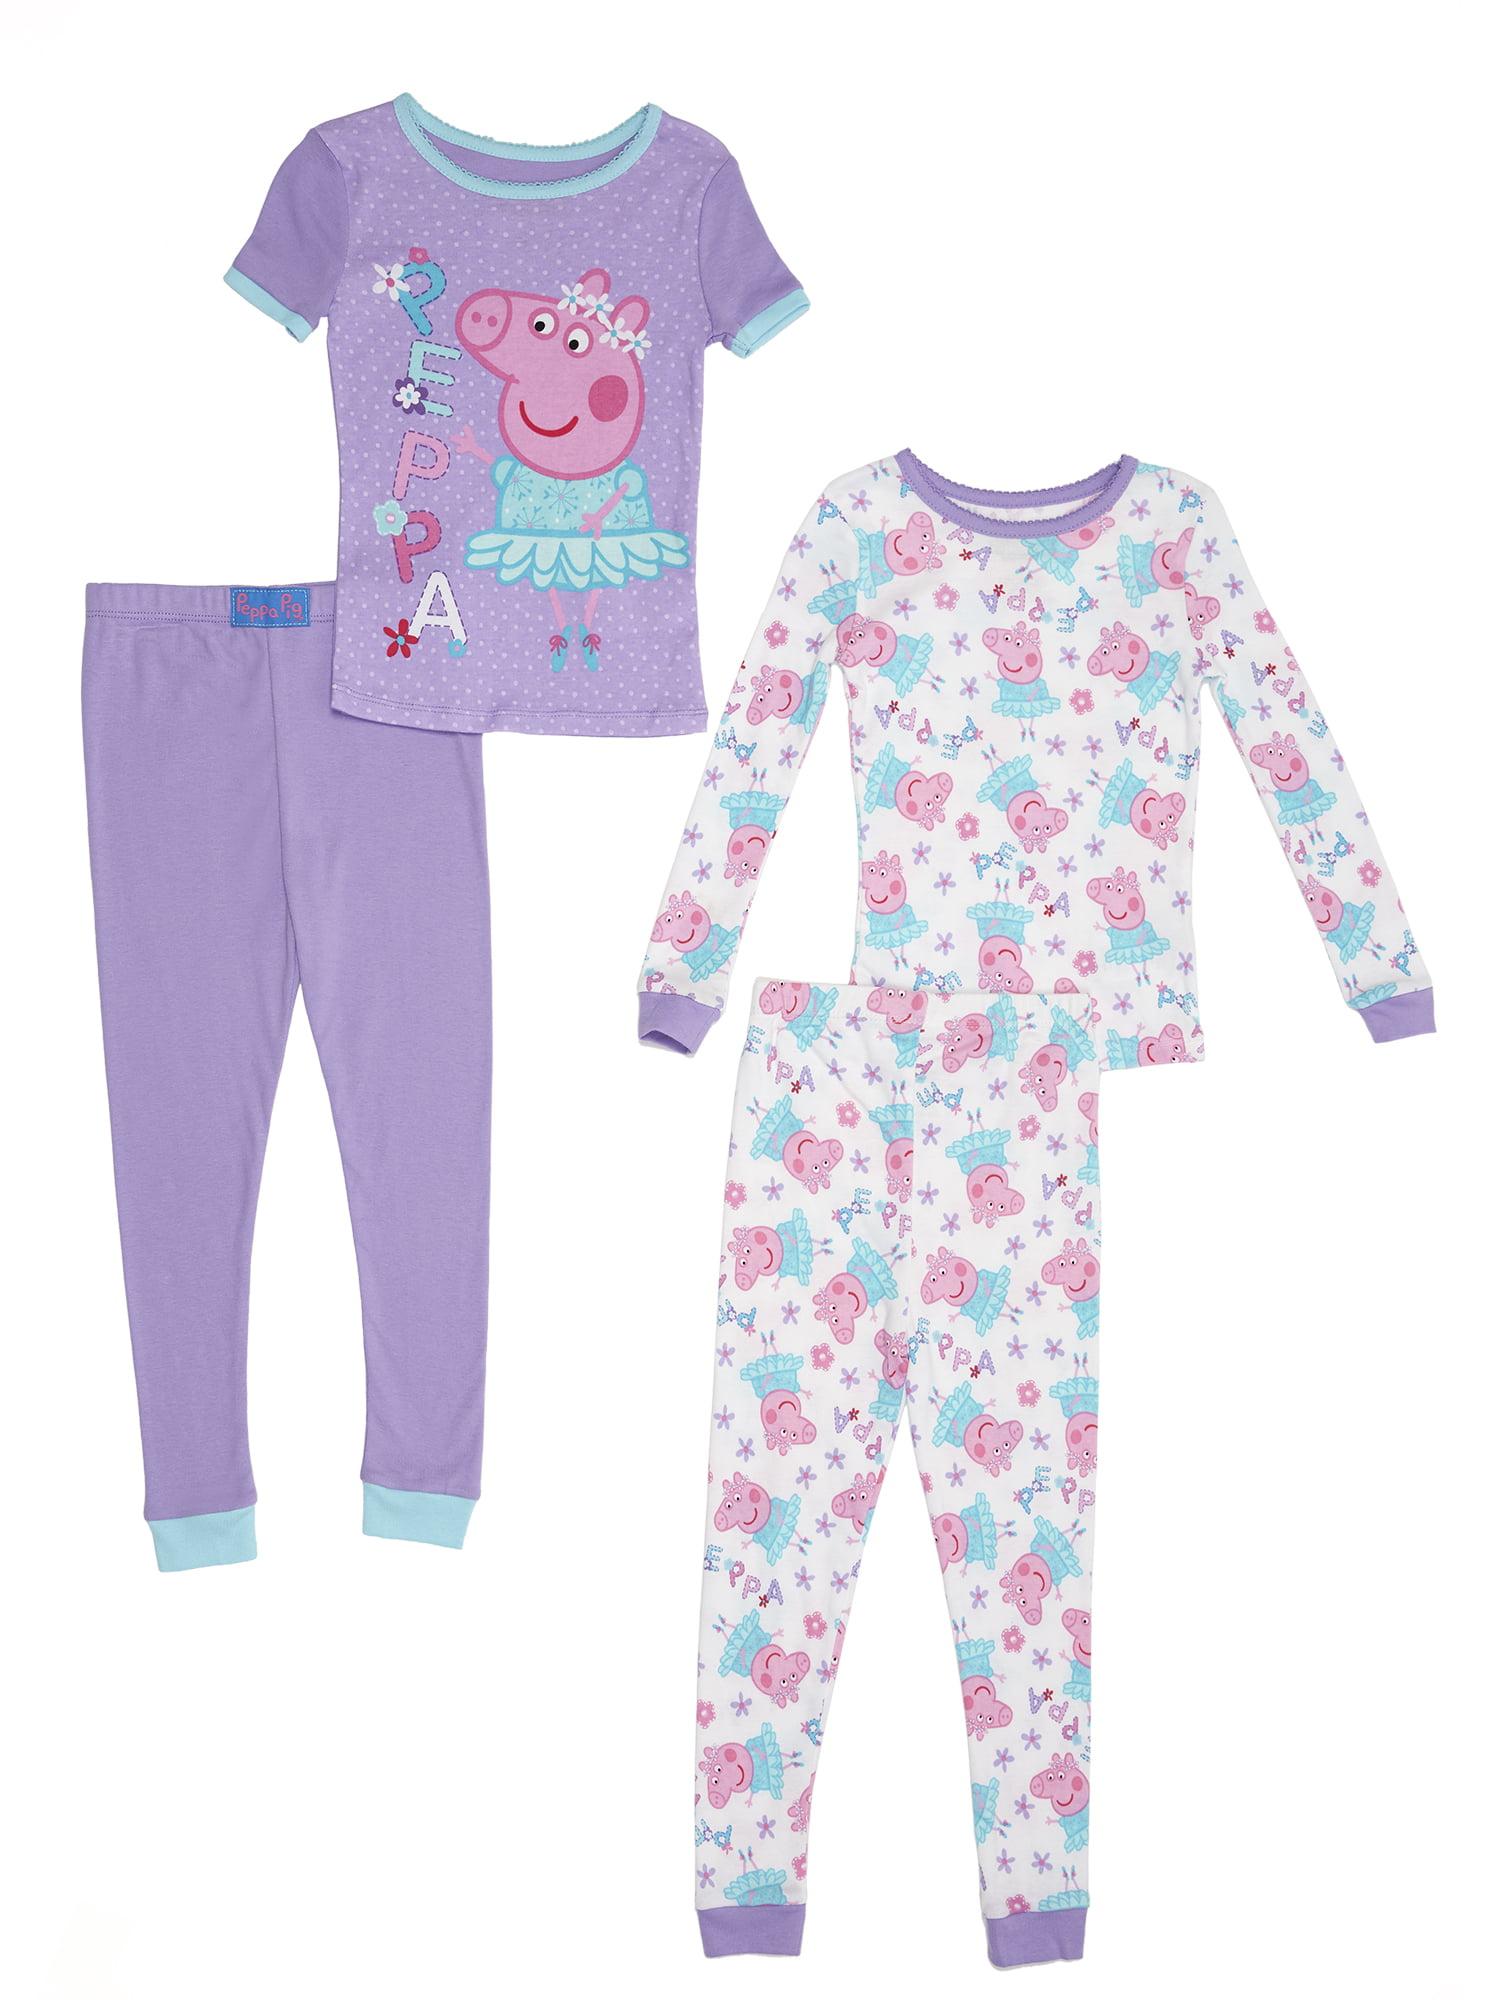 Toddler Girl Cotton Tight Fit Pajamas, 4pc Set